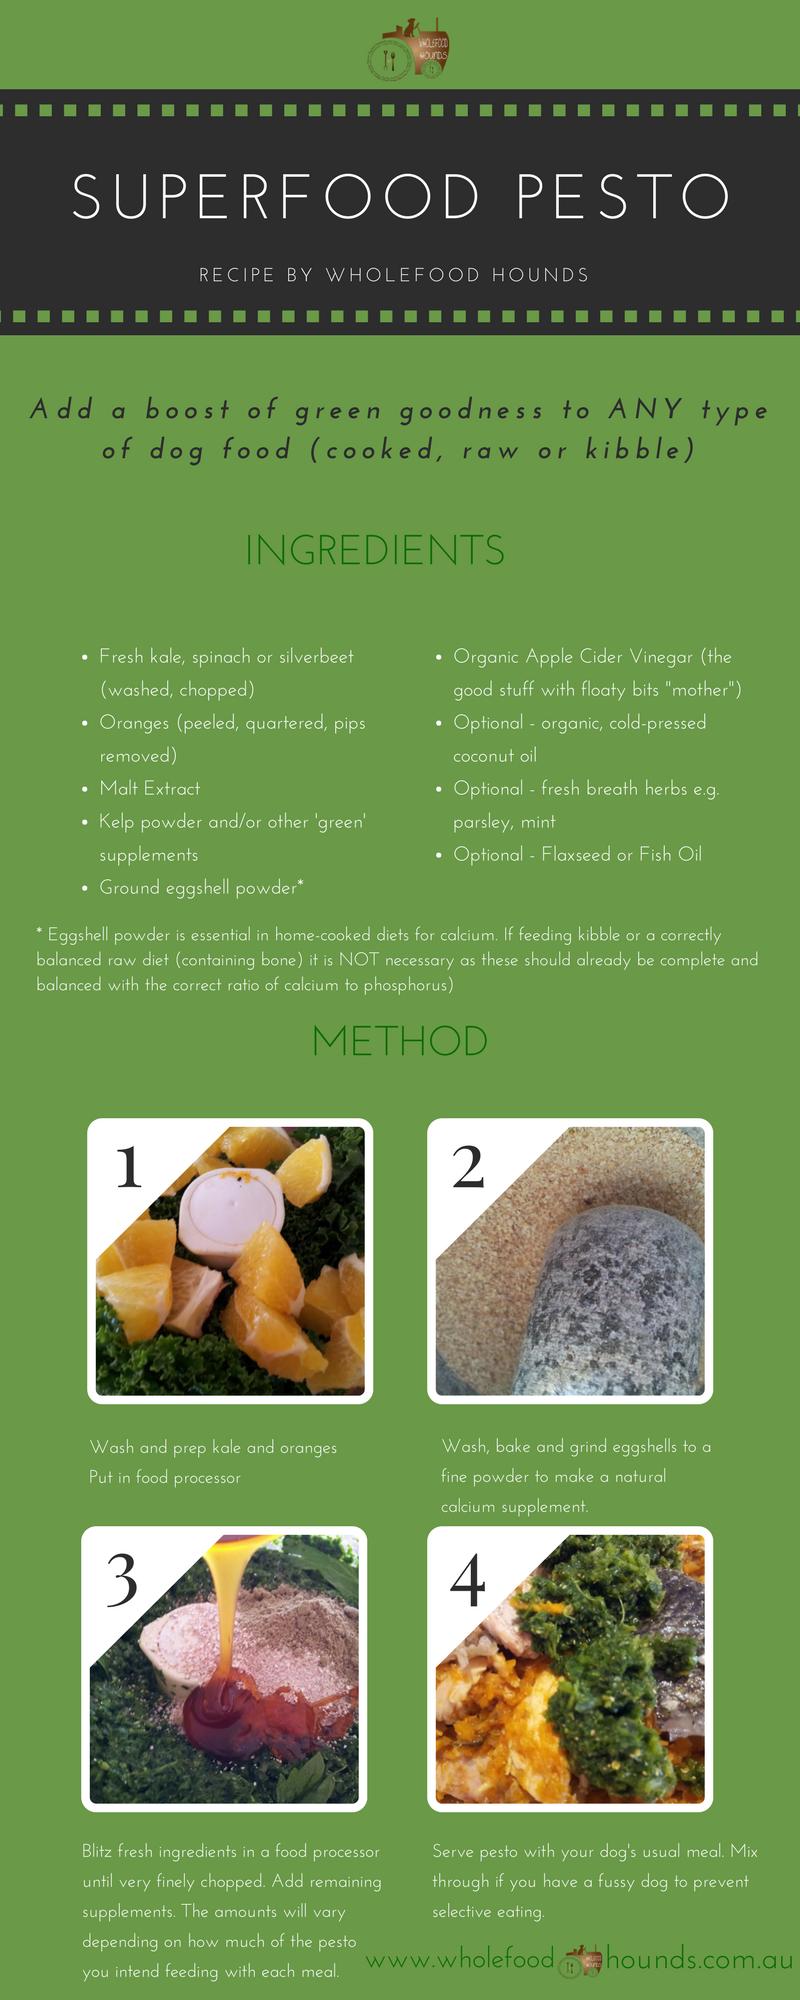 Superfood Pesto Recipe Card